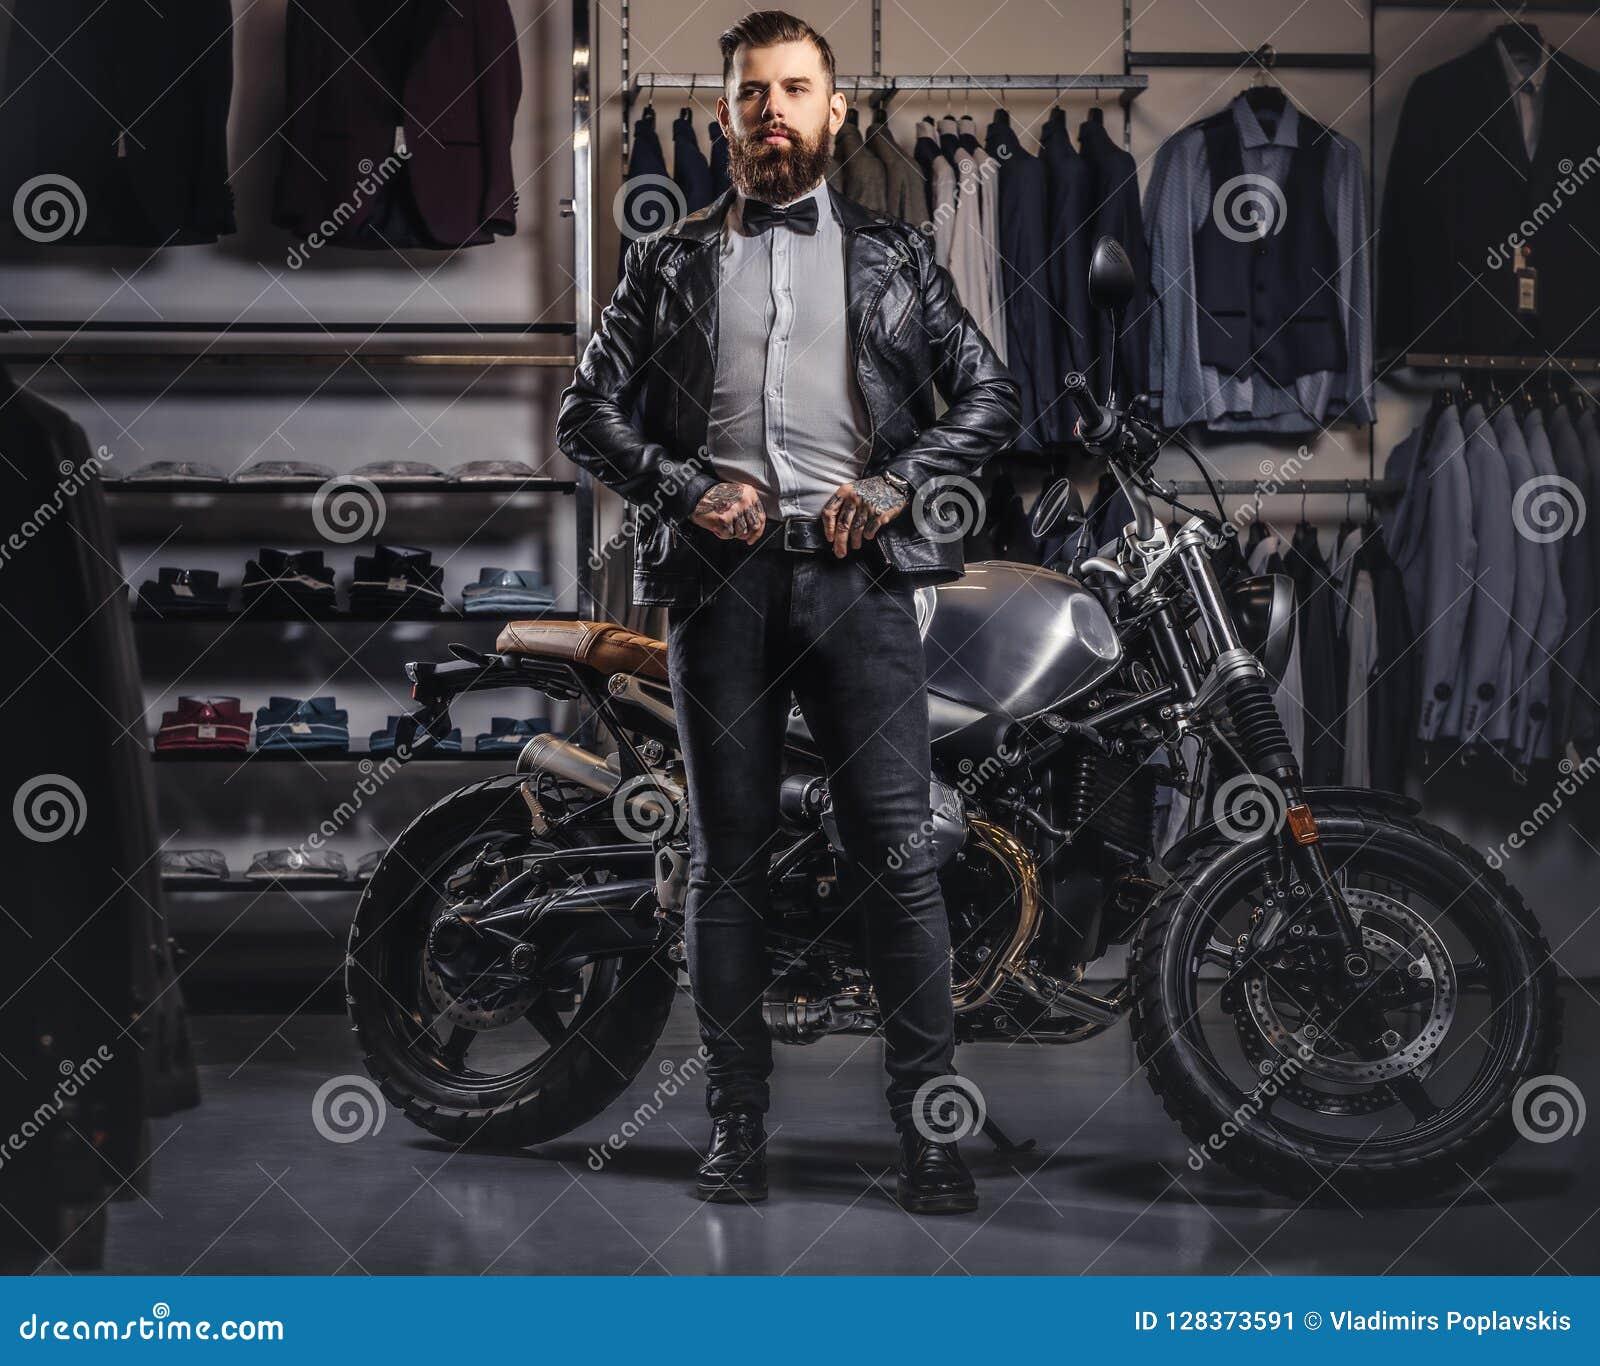 Stylish Tattooed Bearded Man With Dressed In Black Leather Jacket